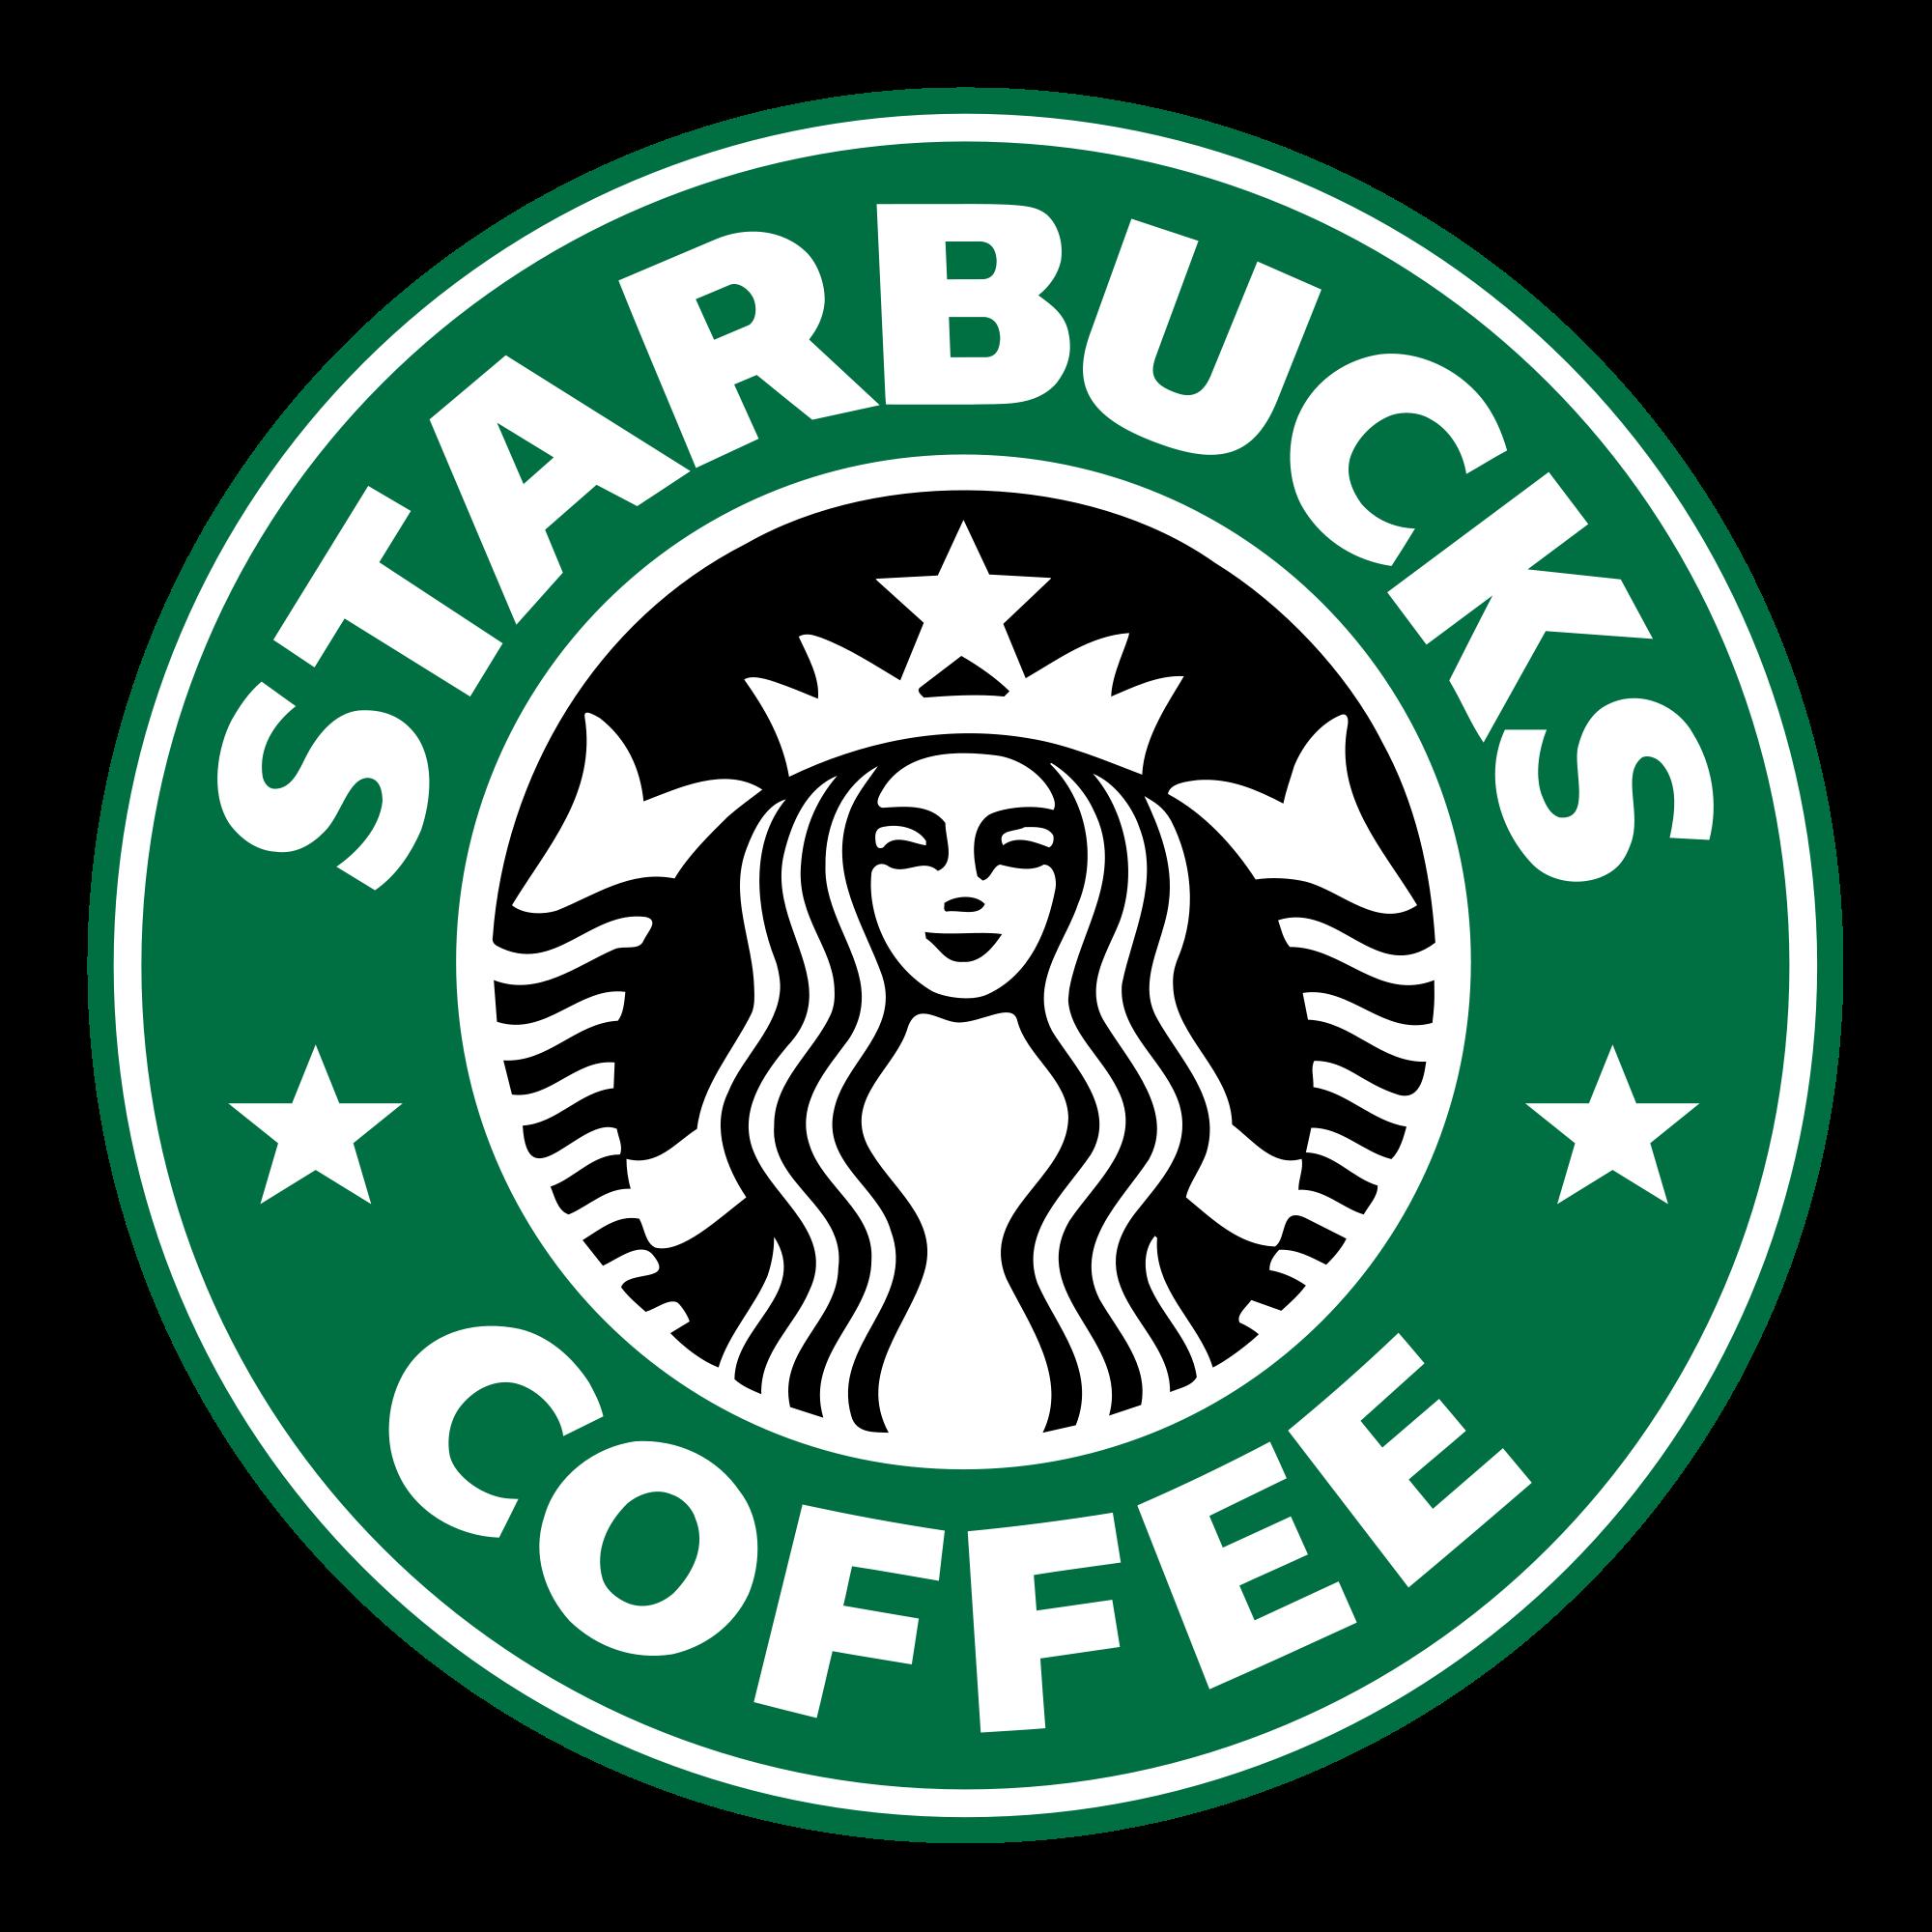 2000x2000 Starbucks Logo Png Mtf Starbucks Logo, Starbucks